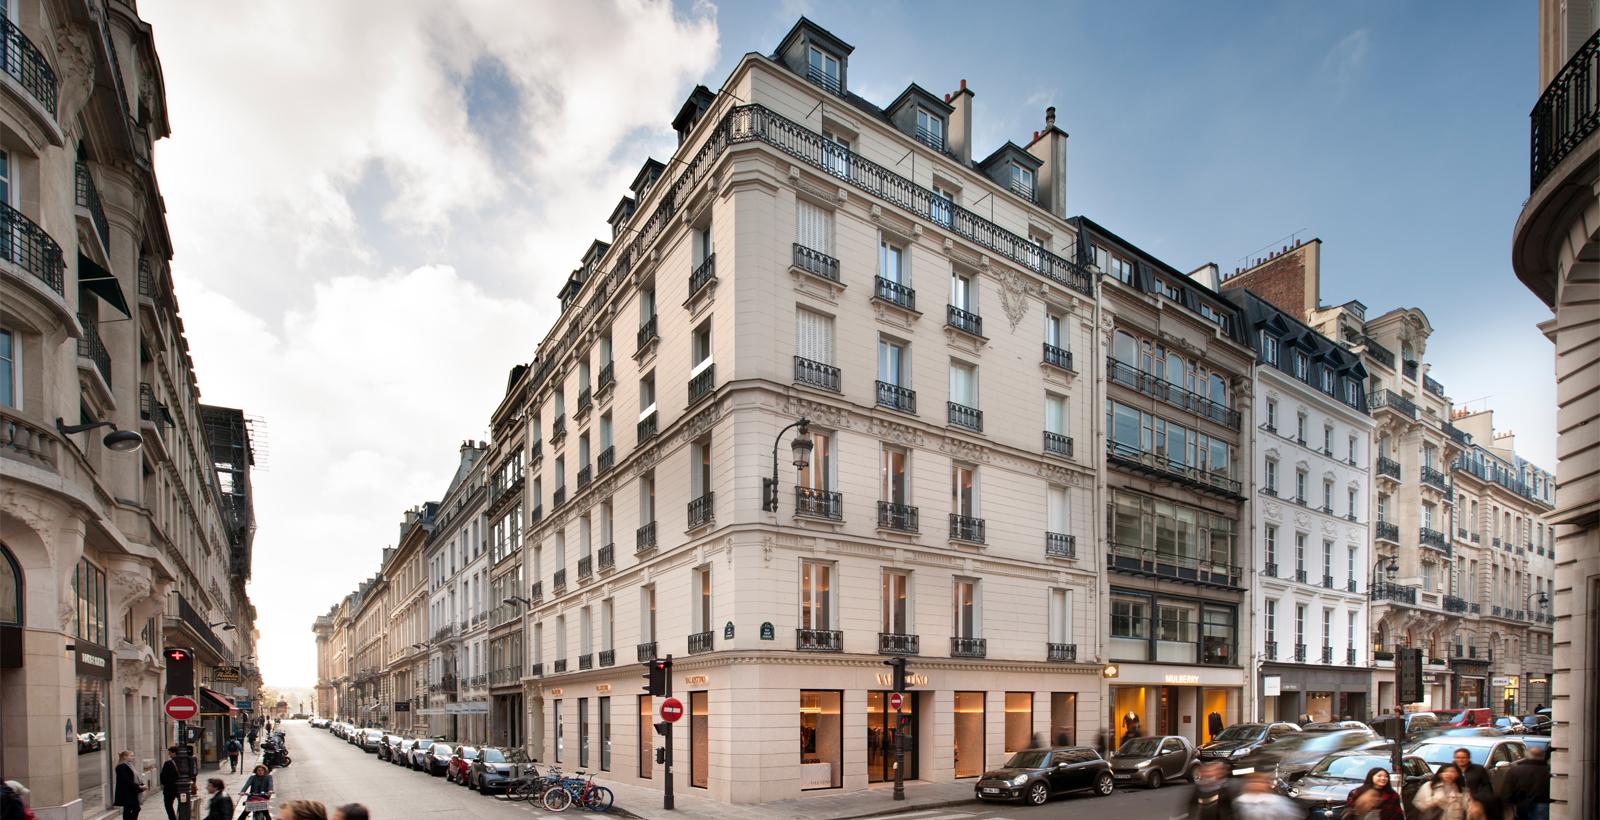 Ulica Saint Honoré w Paryżu